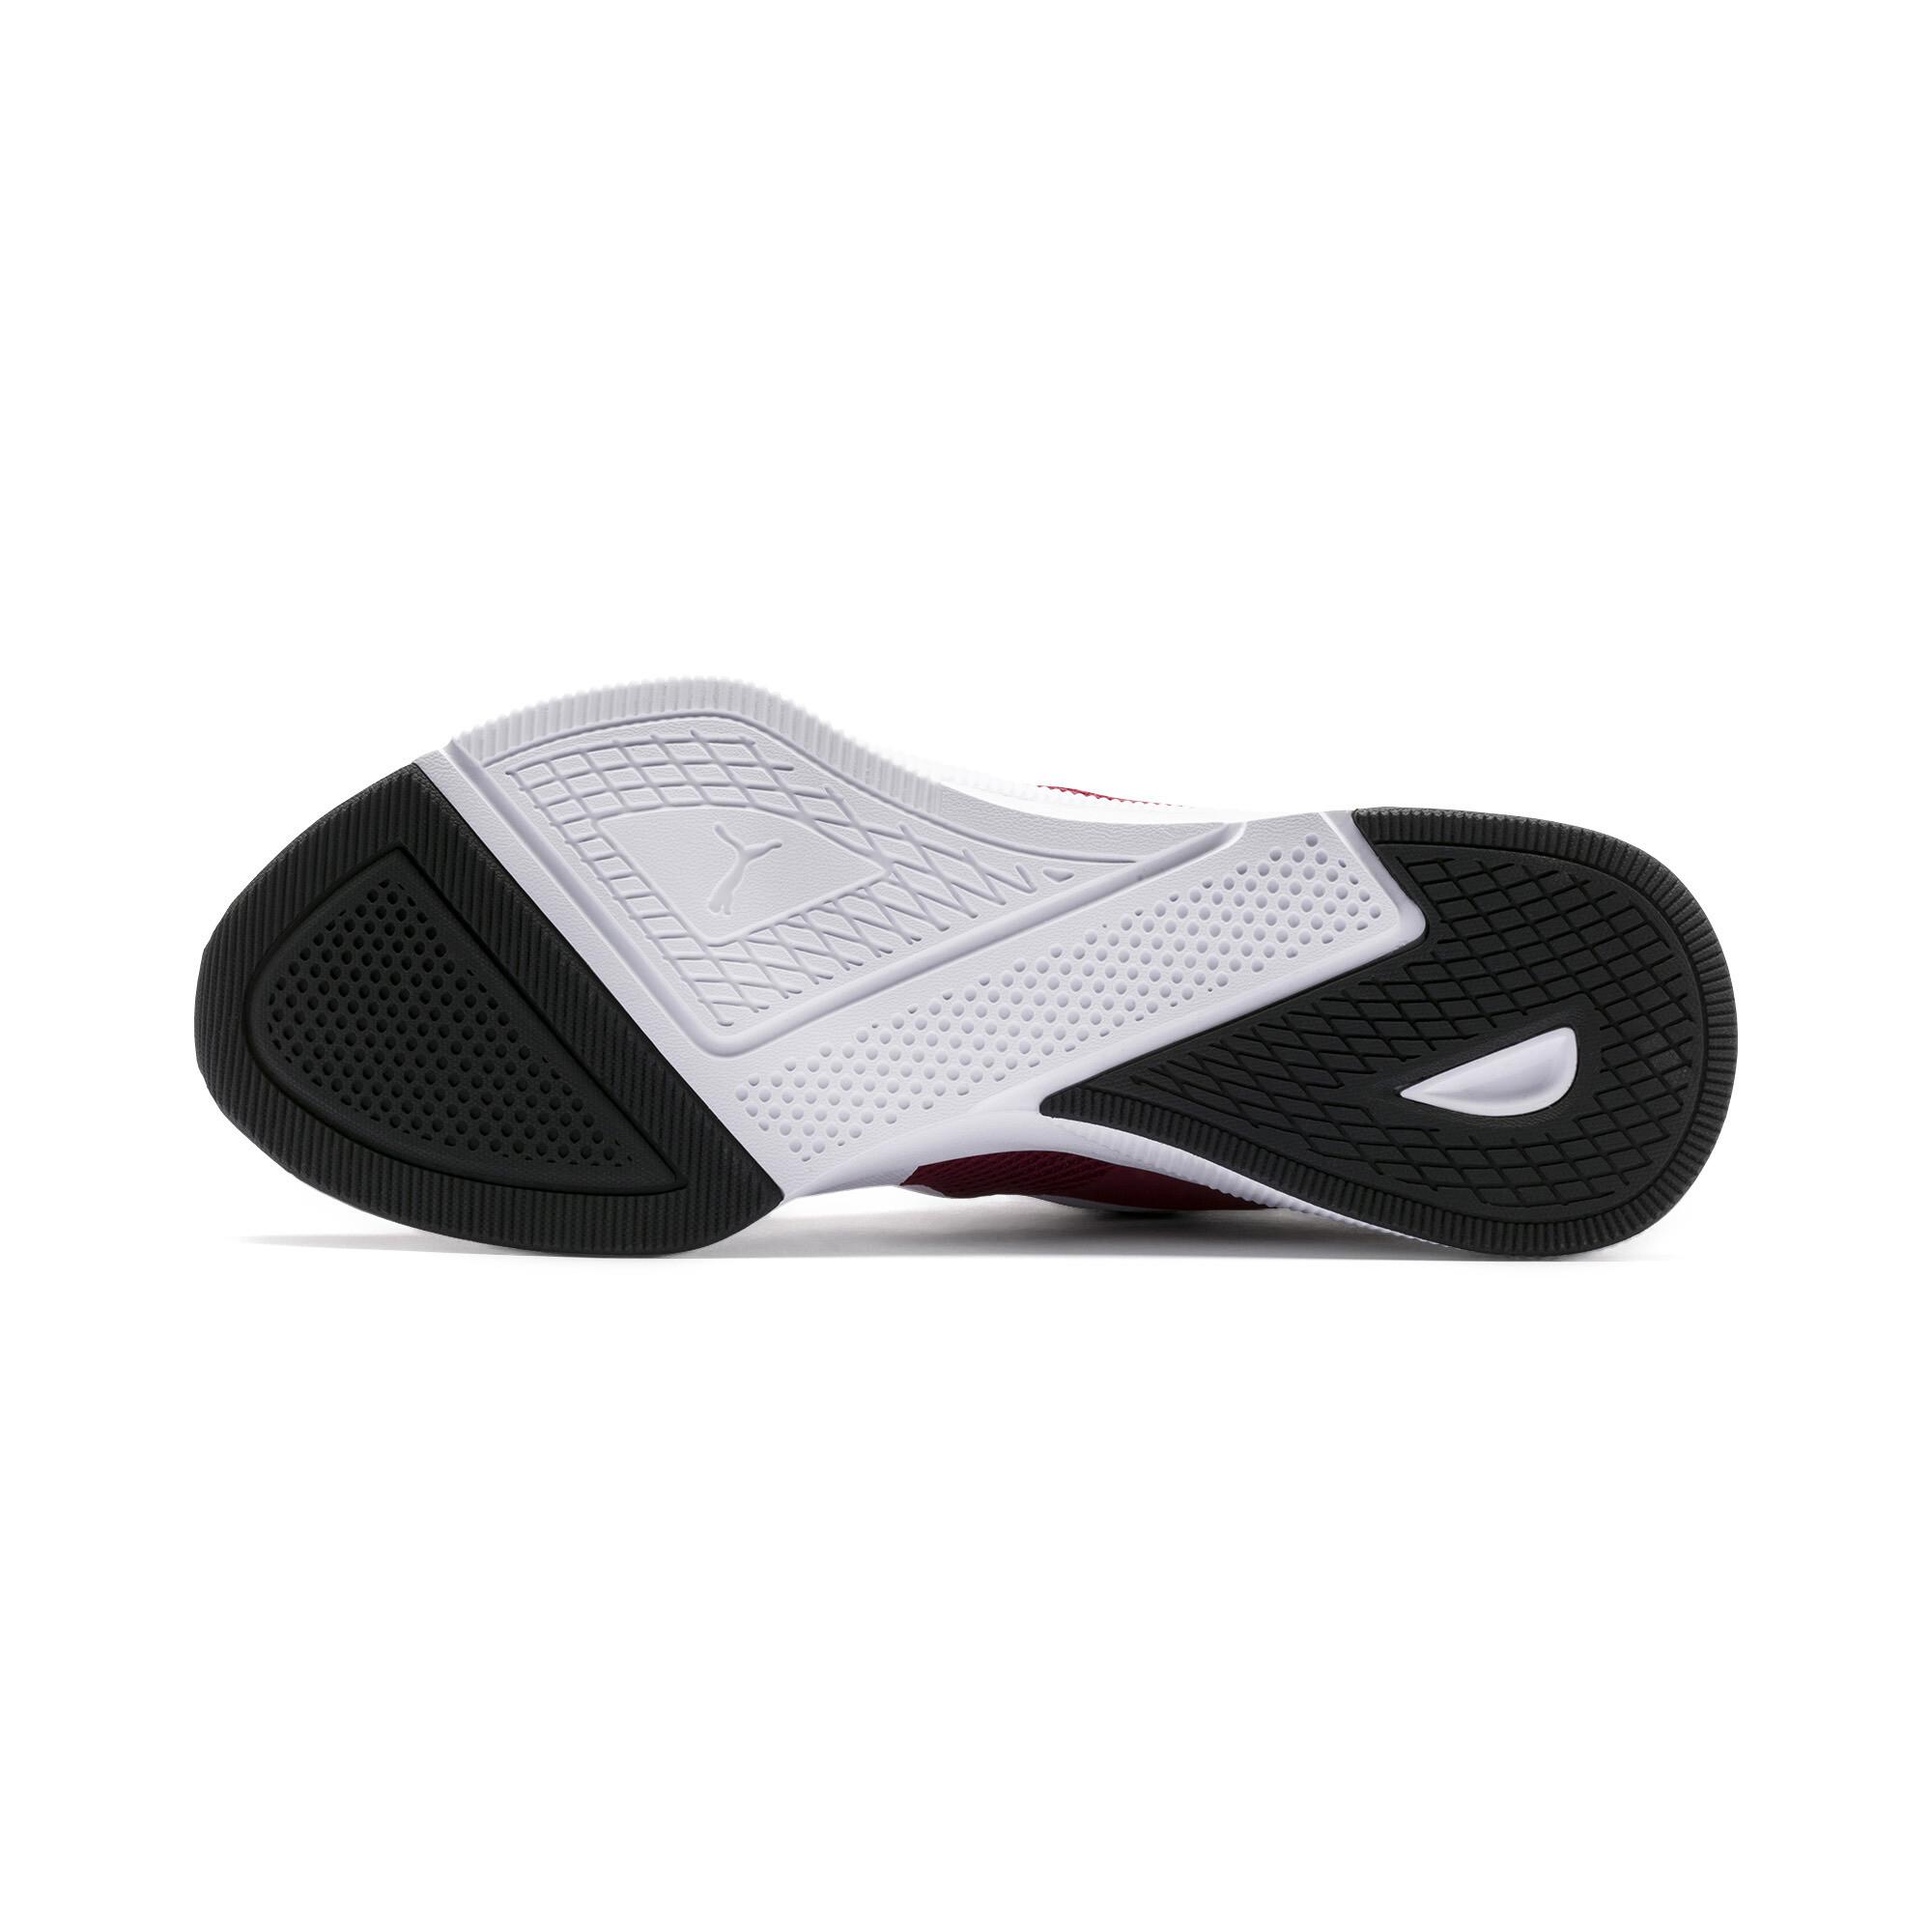 PUMA-Flyer-Runner-Running-Shoes-Mens-Shoe-Running thumbnail 25